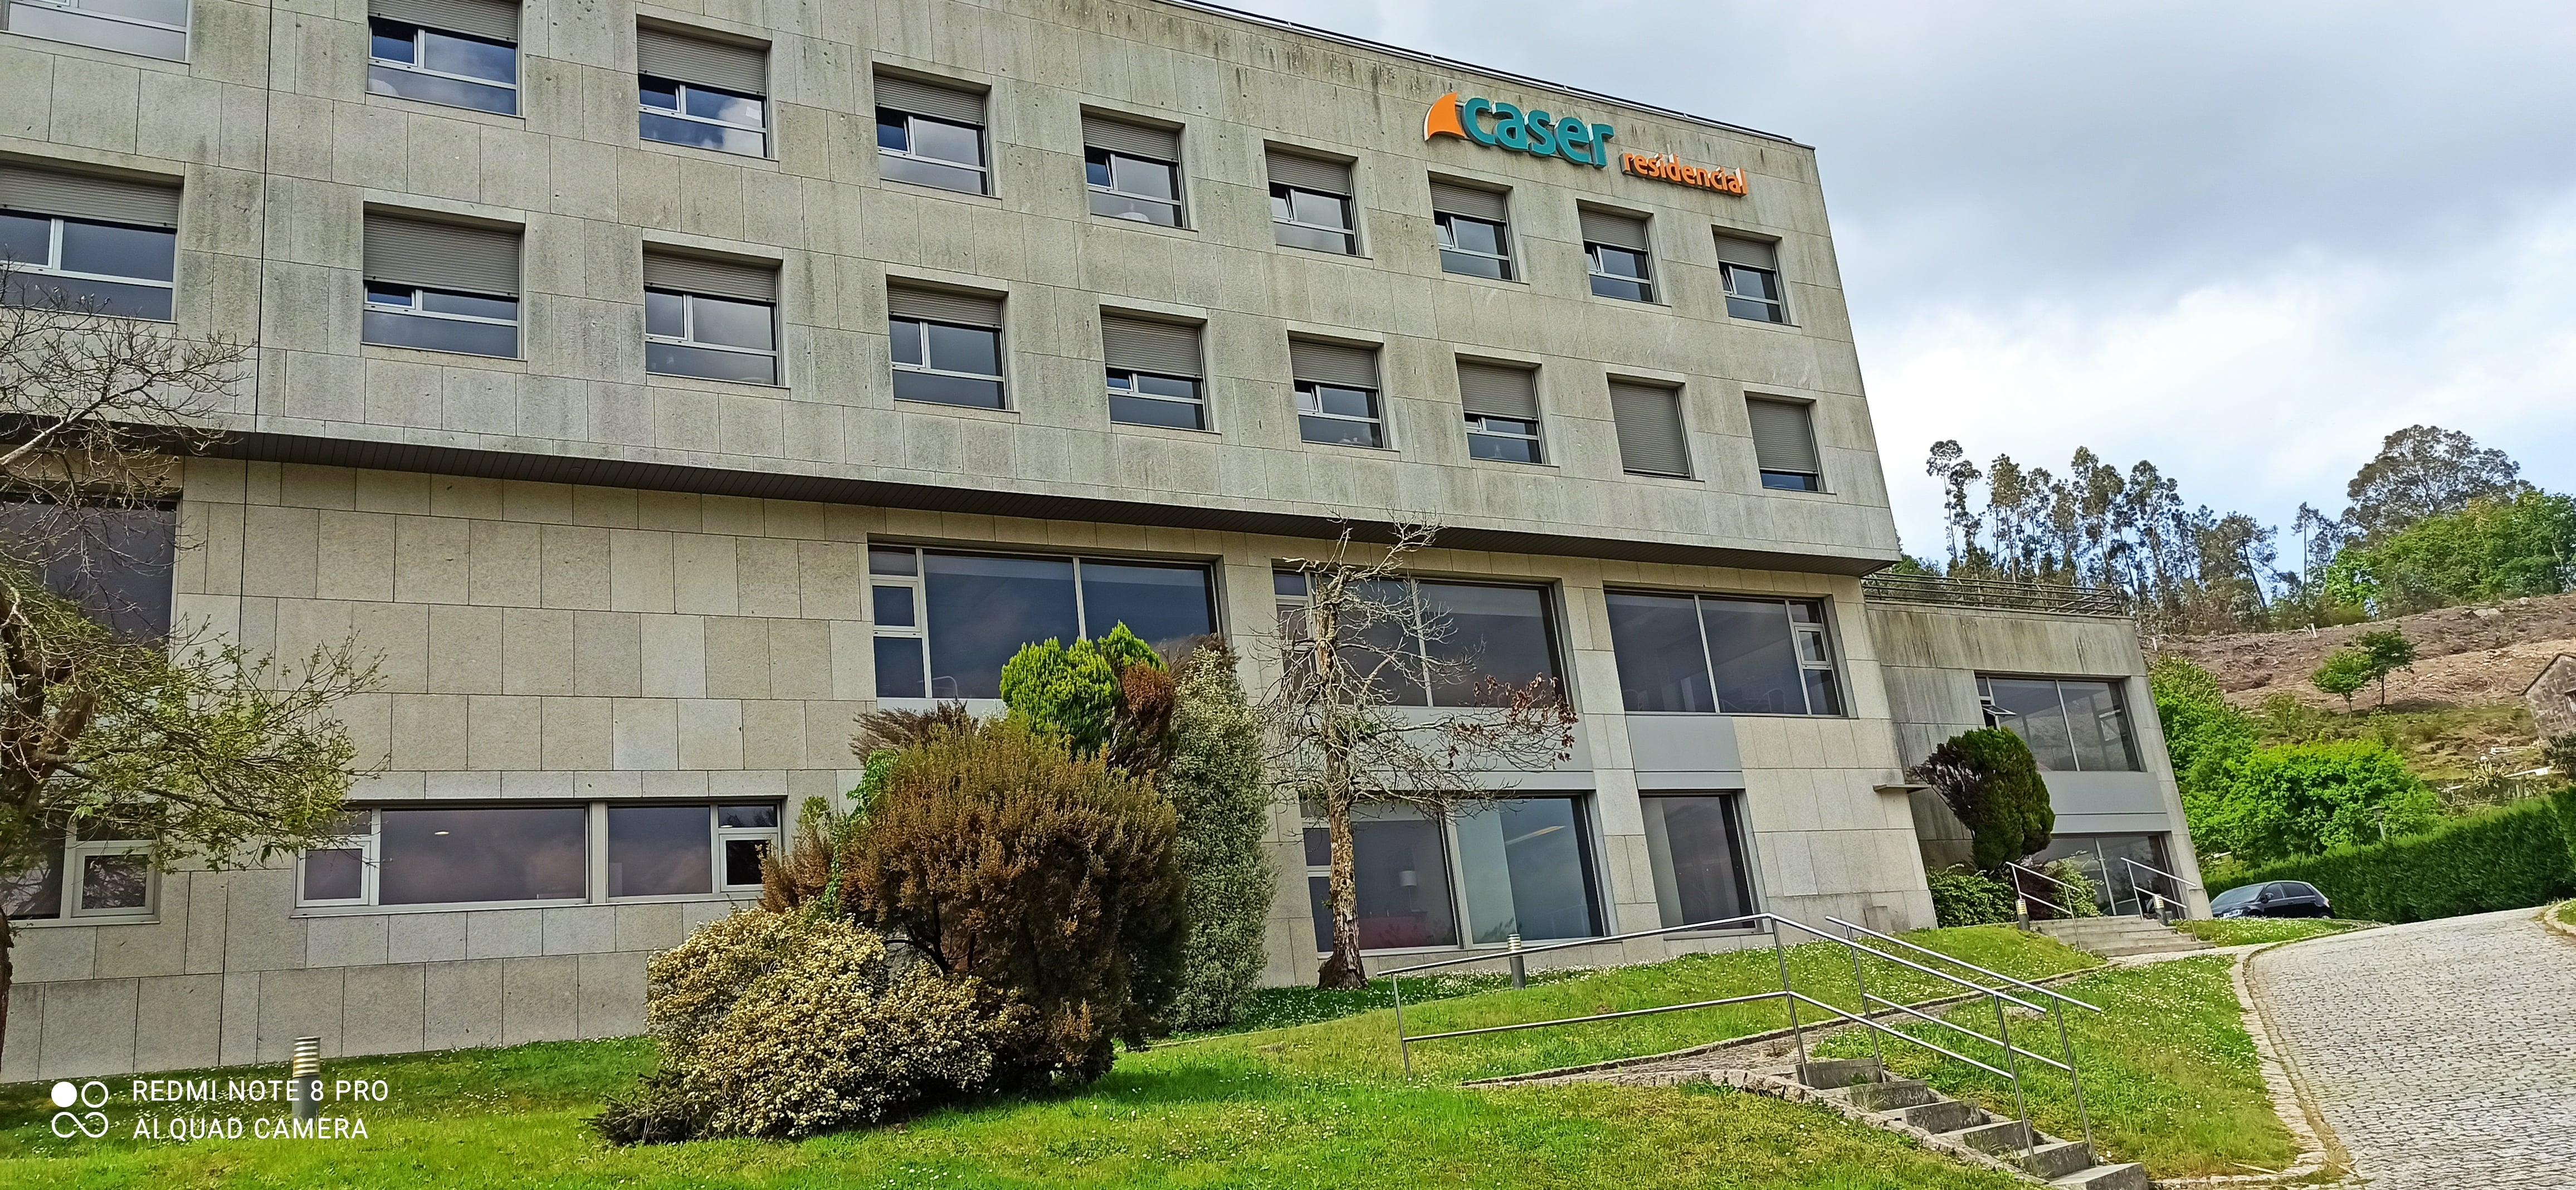 Cáser_Residenciasl_Pontevedra_Fachada